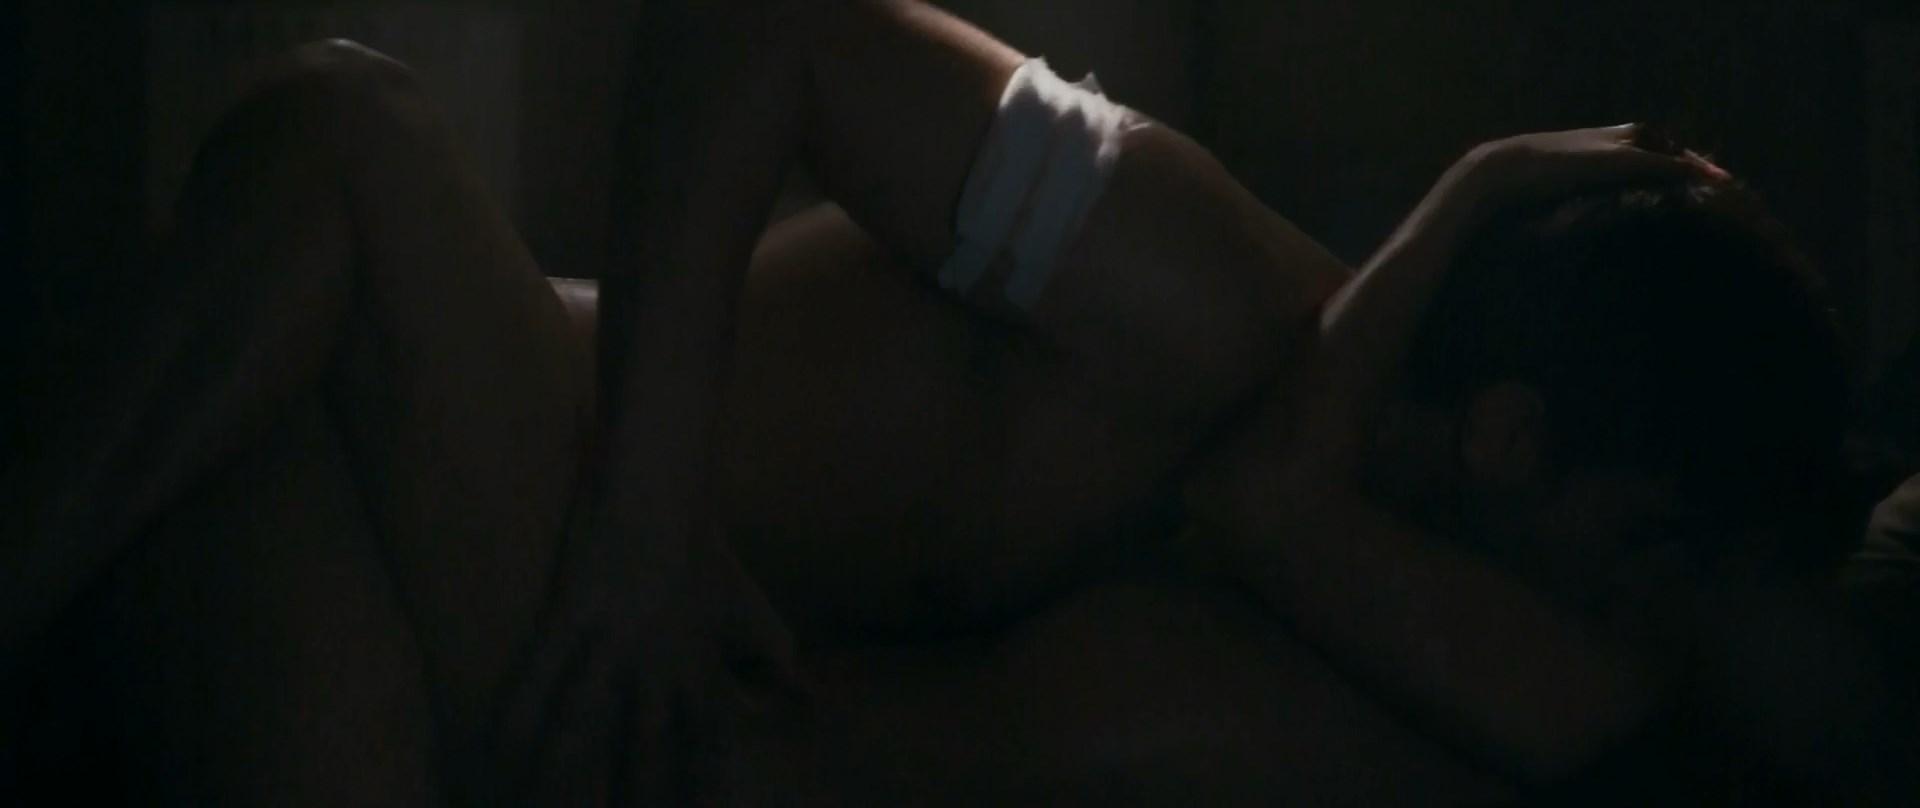 Evgeniya Serebrennikova nude - Rasplata s01e04 (2015)